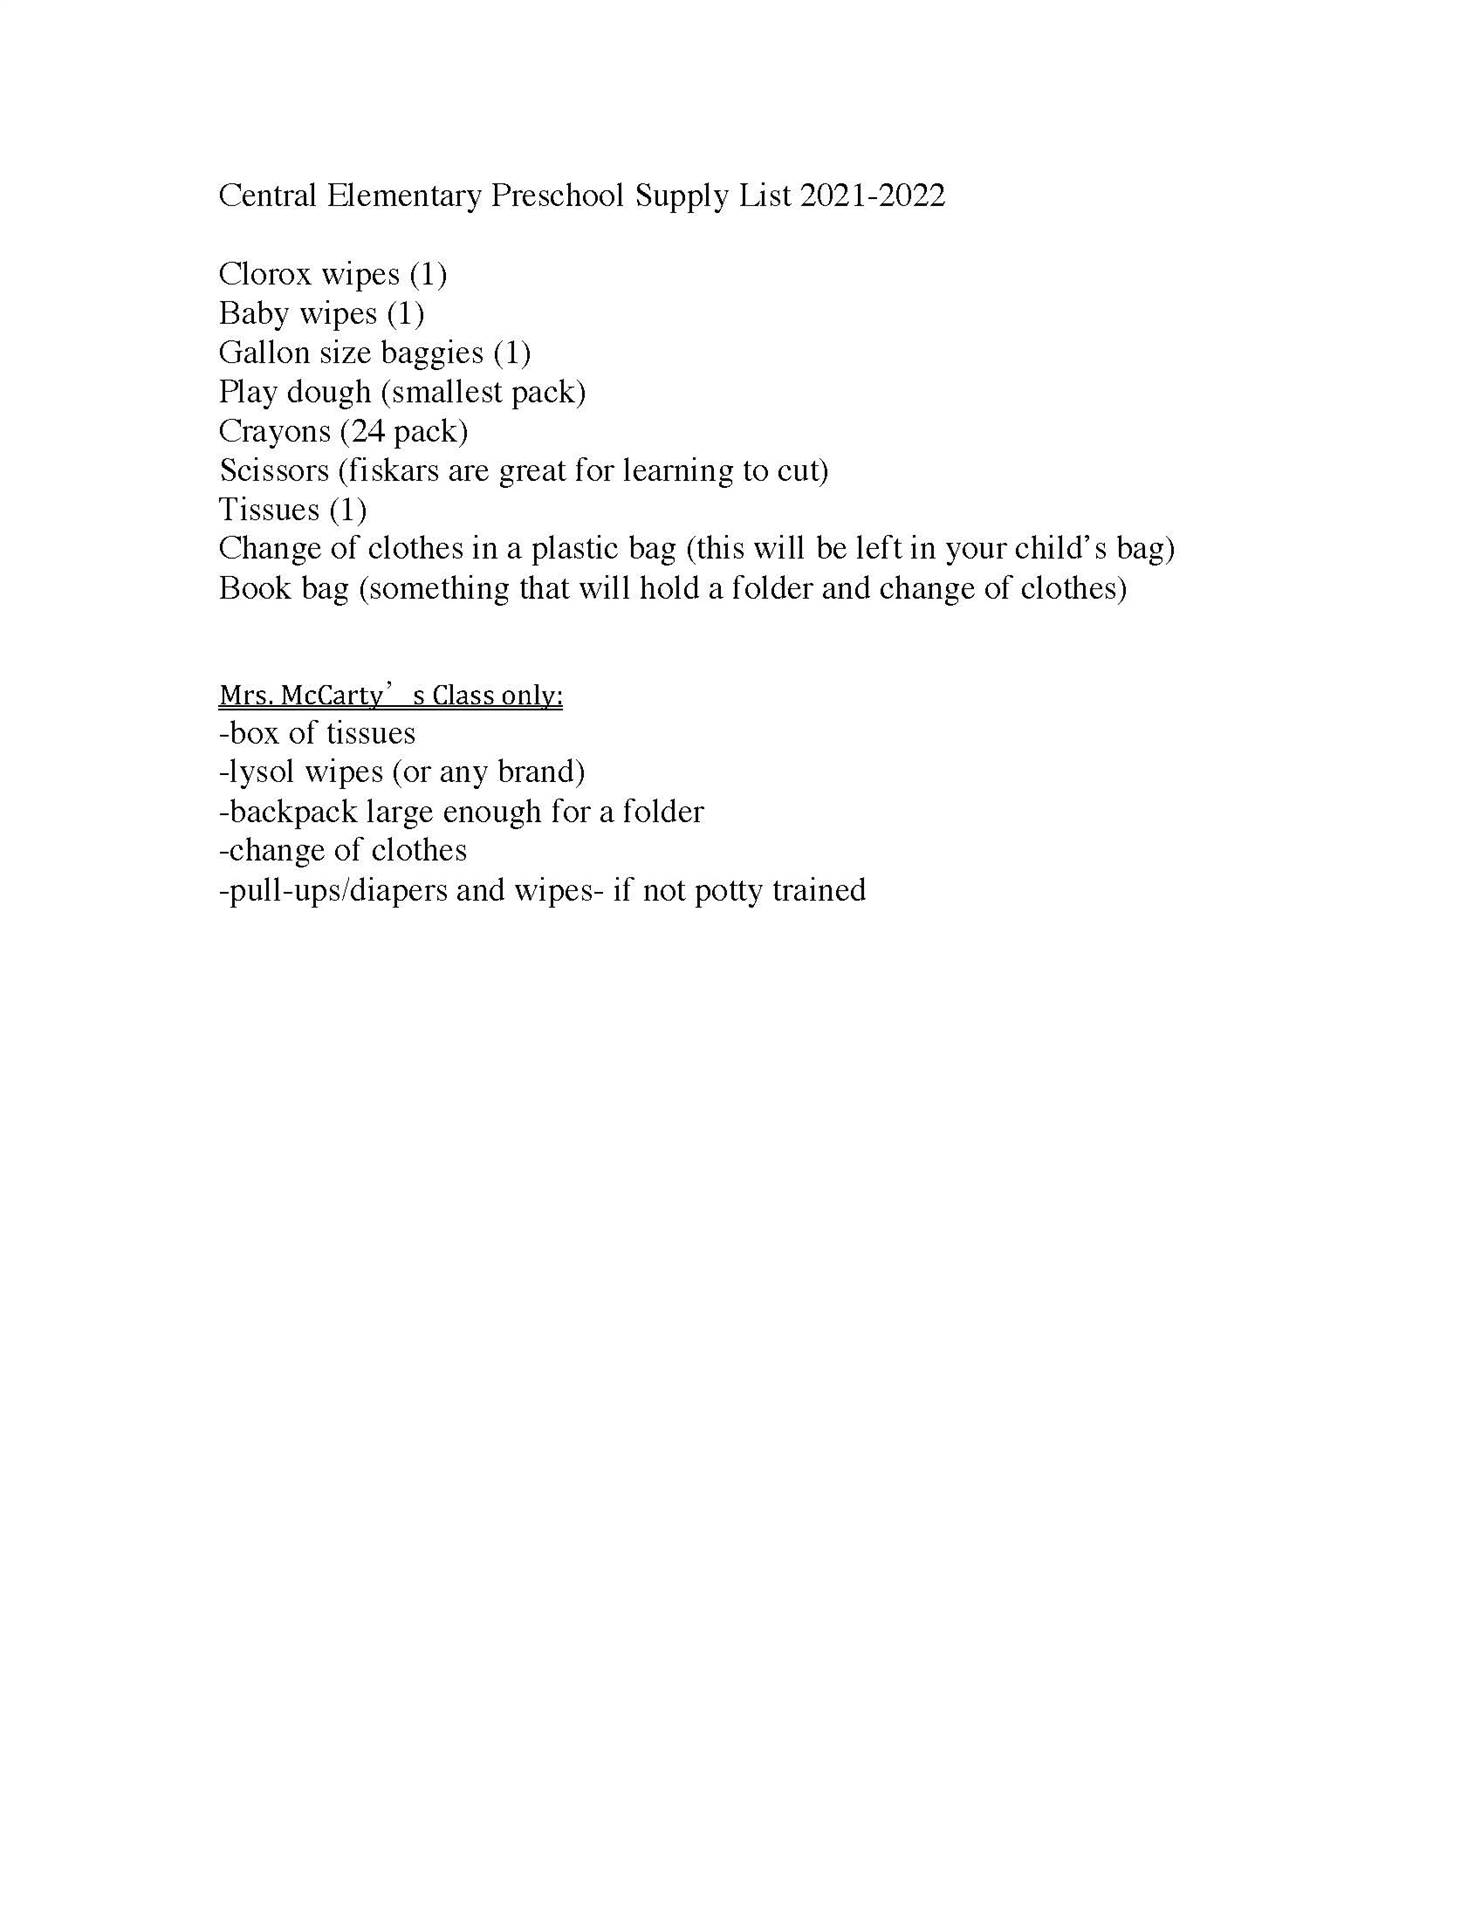 Central Preschool Suggested School Supply List